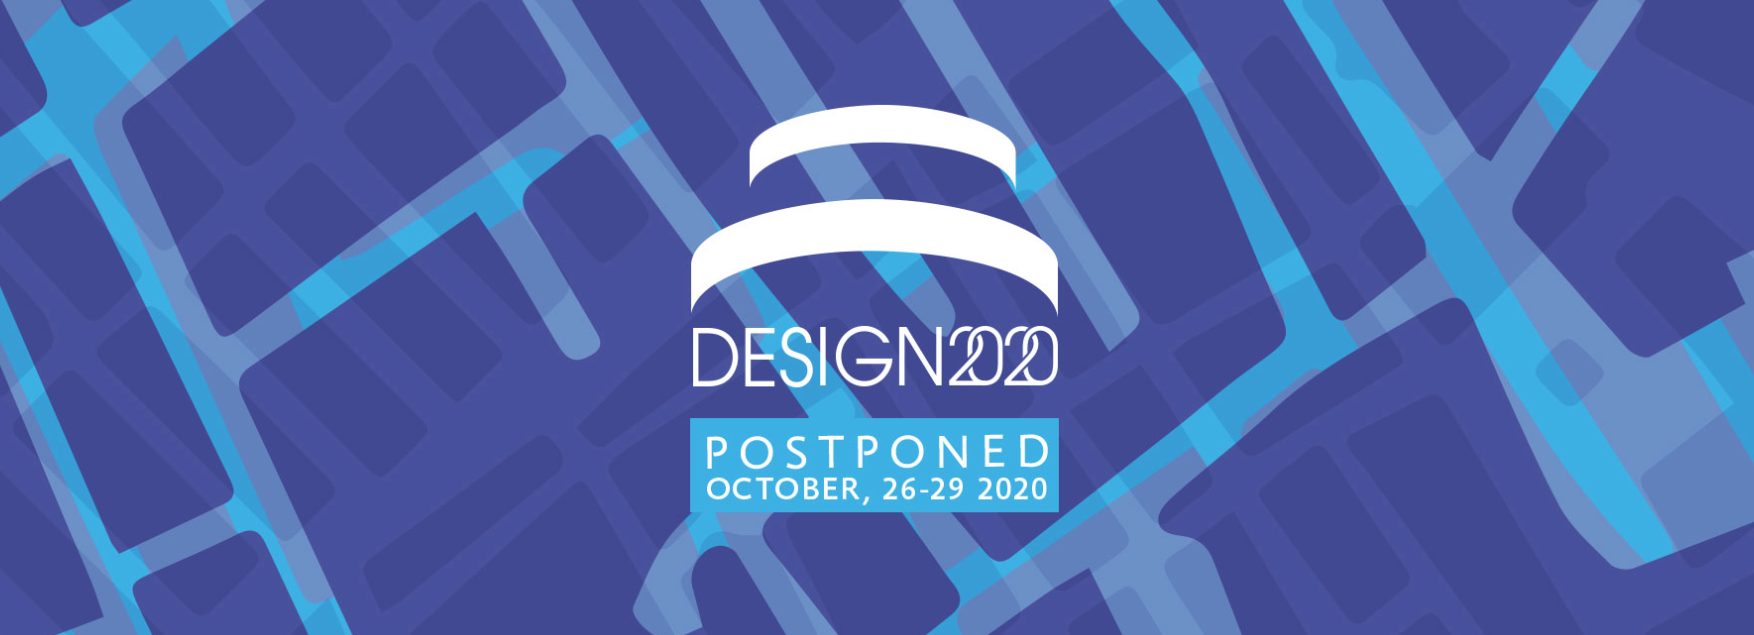 DESIGN 2020 Conference